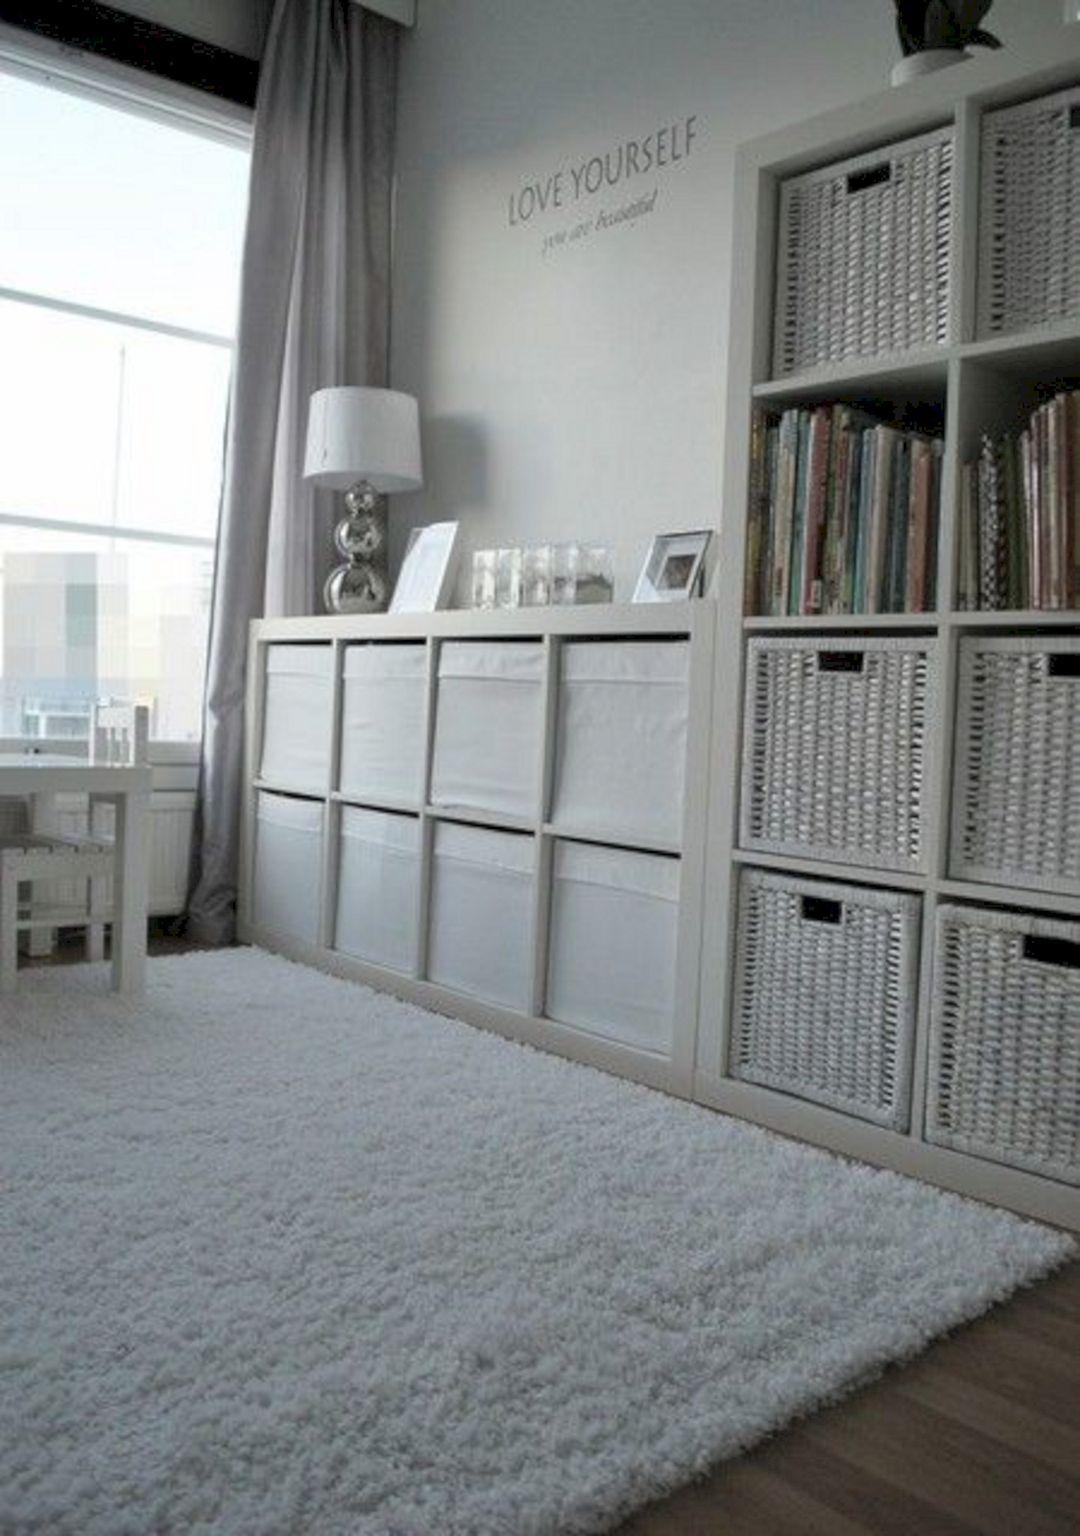 30 Ideas Diy Organization Bedroom Ideas Storage Solutions For 2019 Bedroom Diy Bedroom Design Bedroom Storage